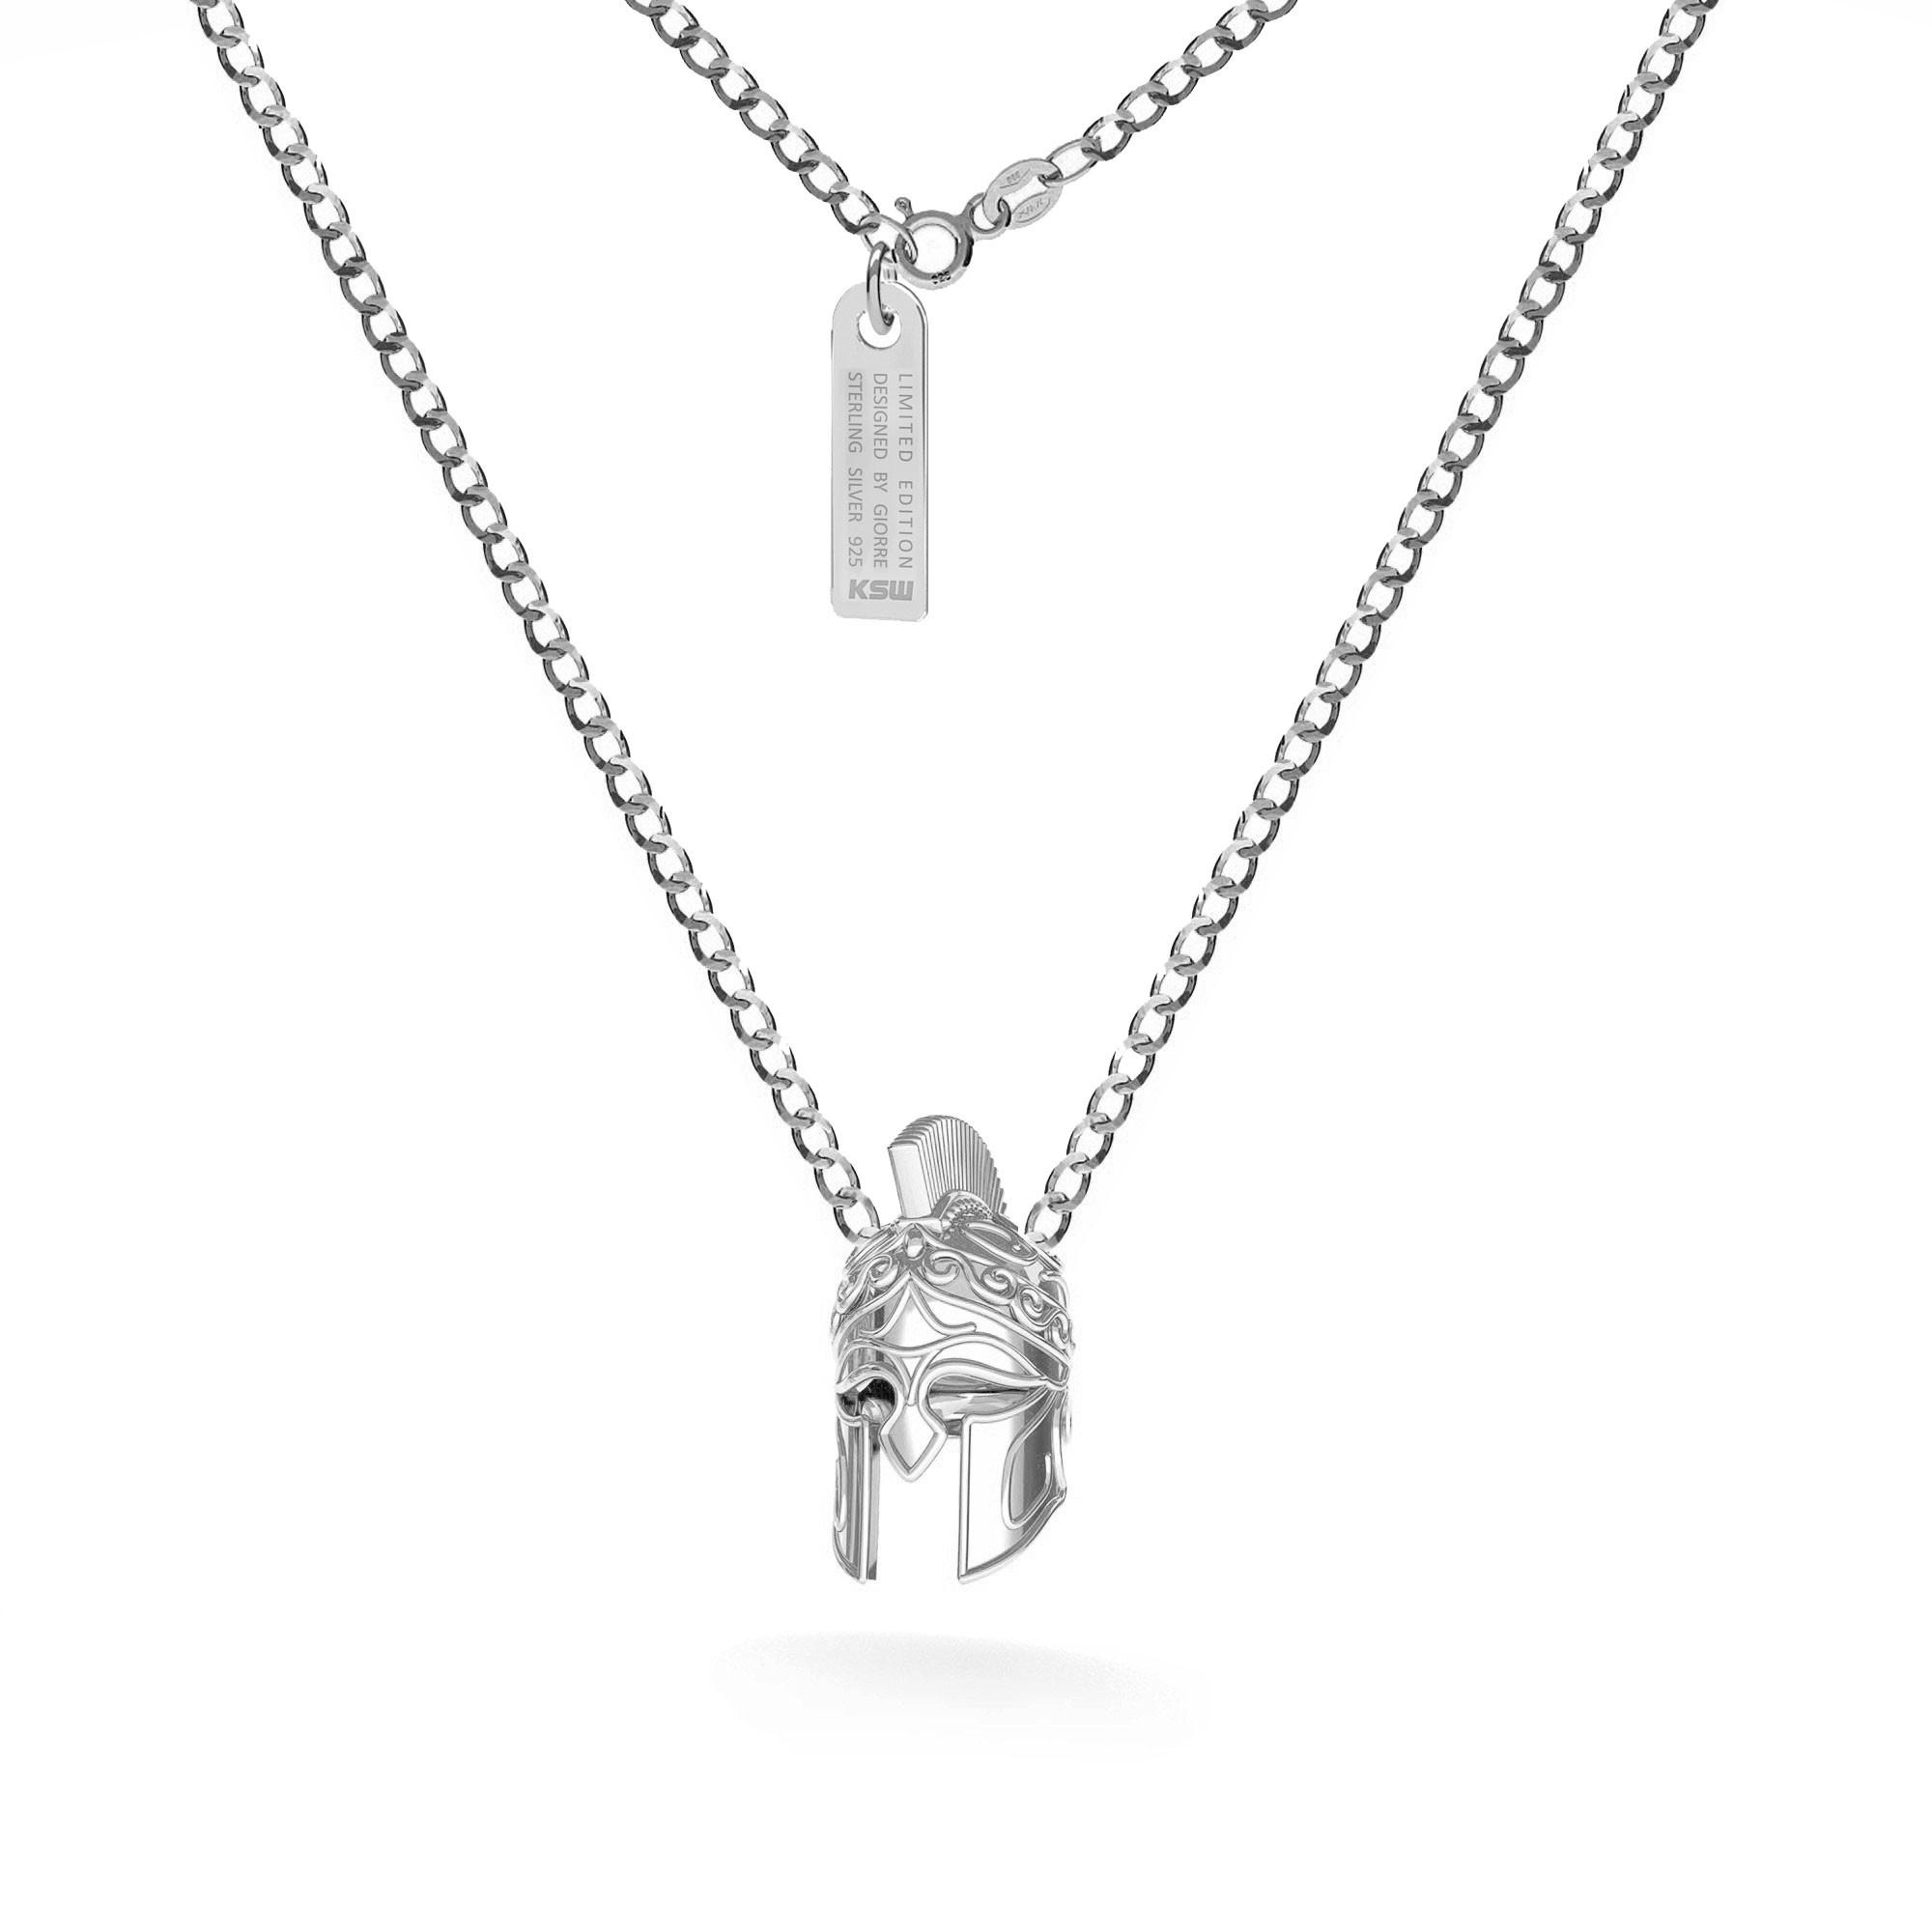 Naszyjnik hełm spartański, łańcuch pancerka, srebro 925